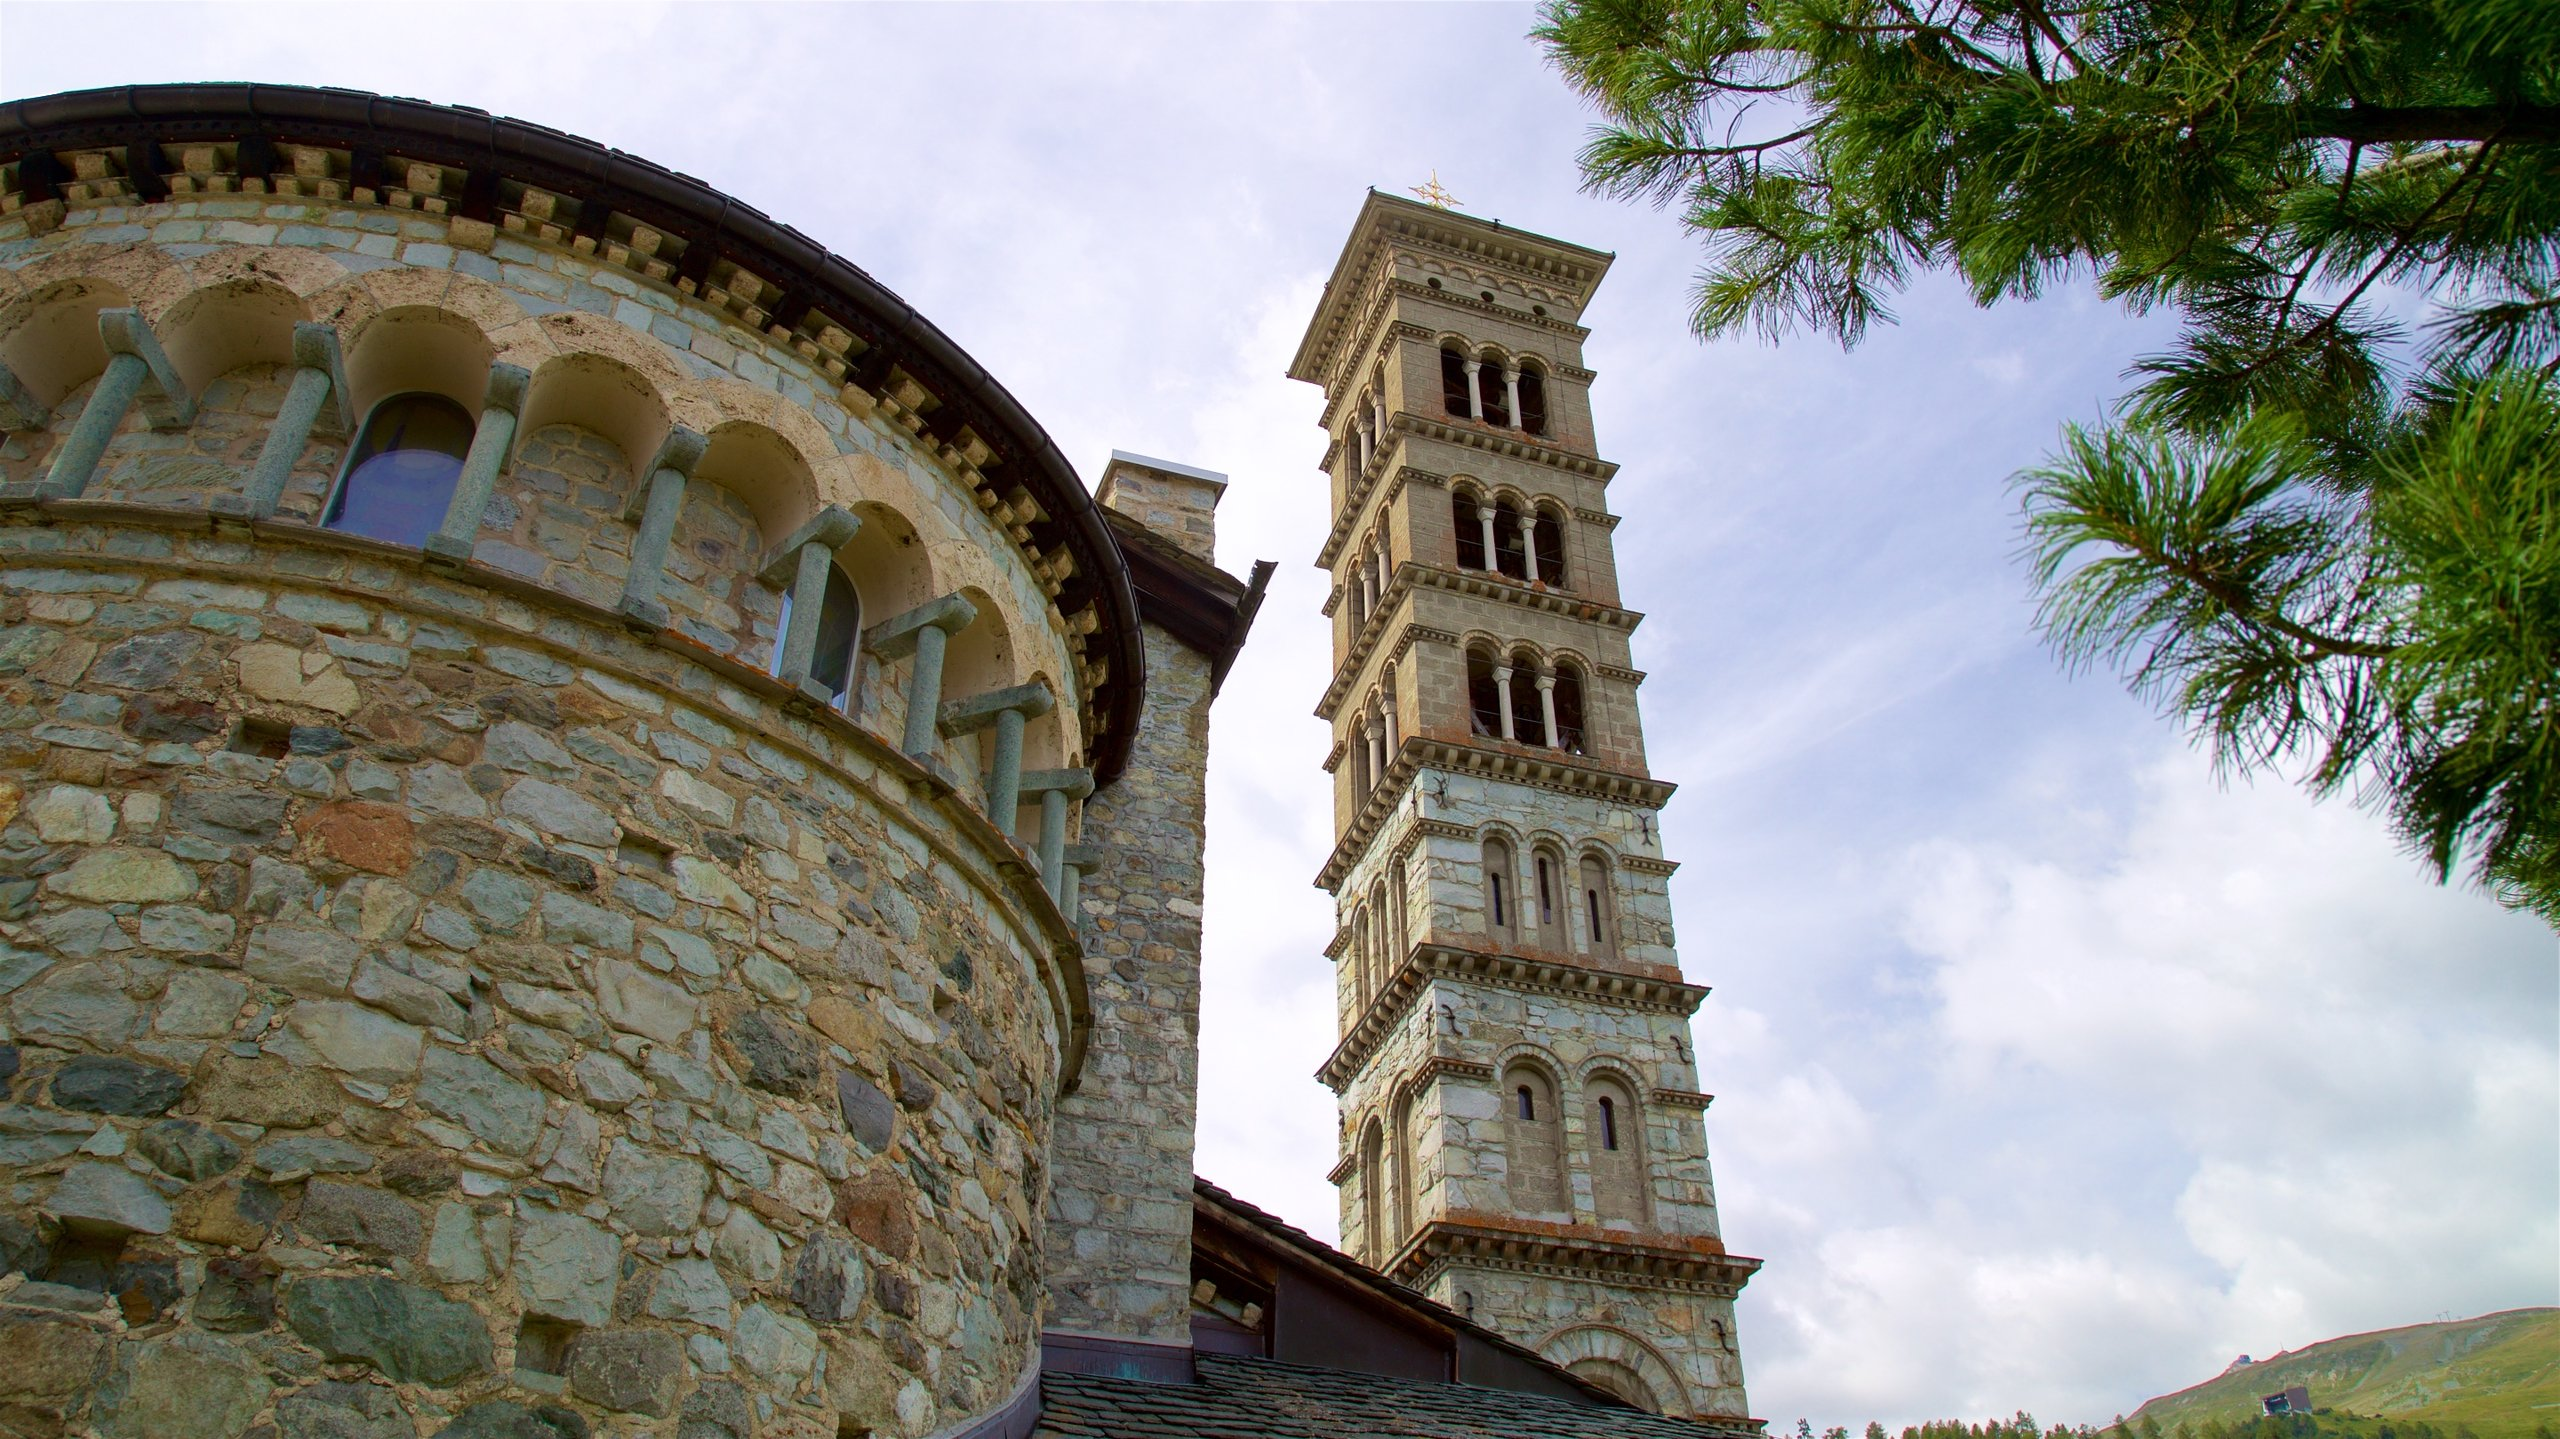 St. Moritz Leaning Tower, St. Moritz, Graubuenden, Switzerland